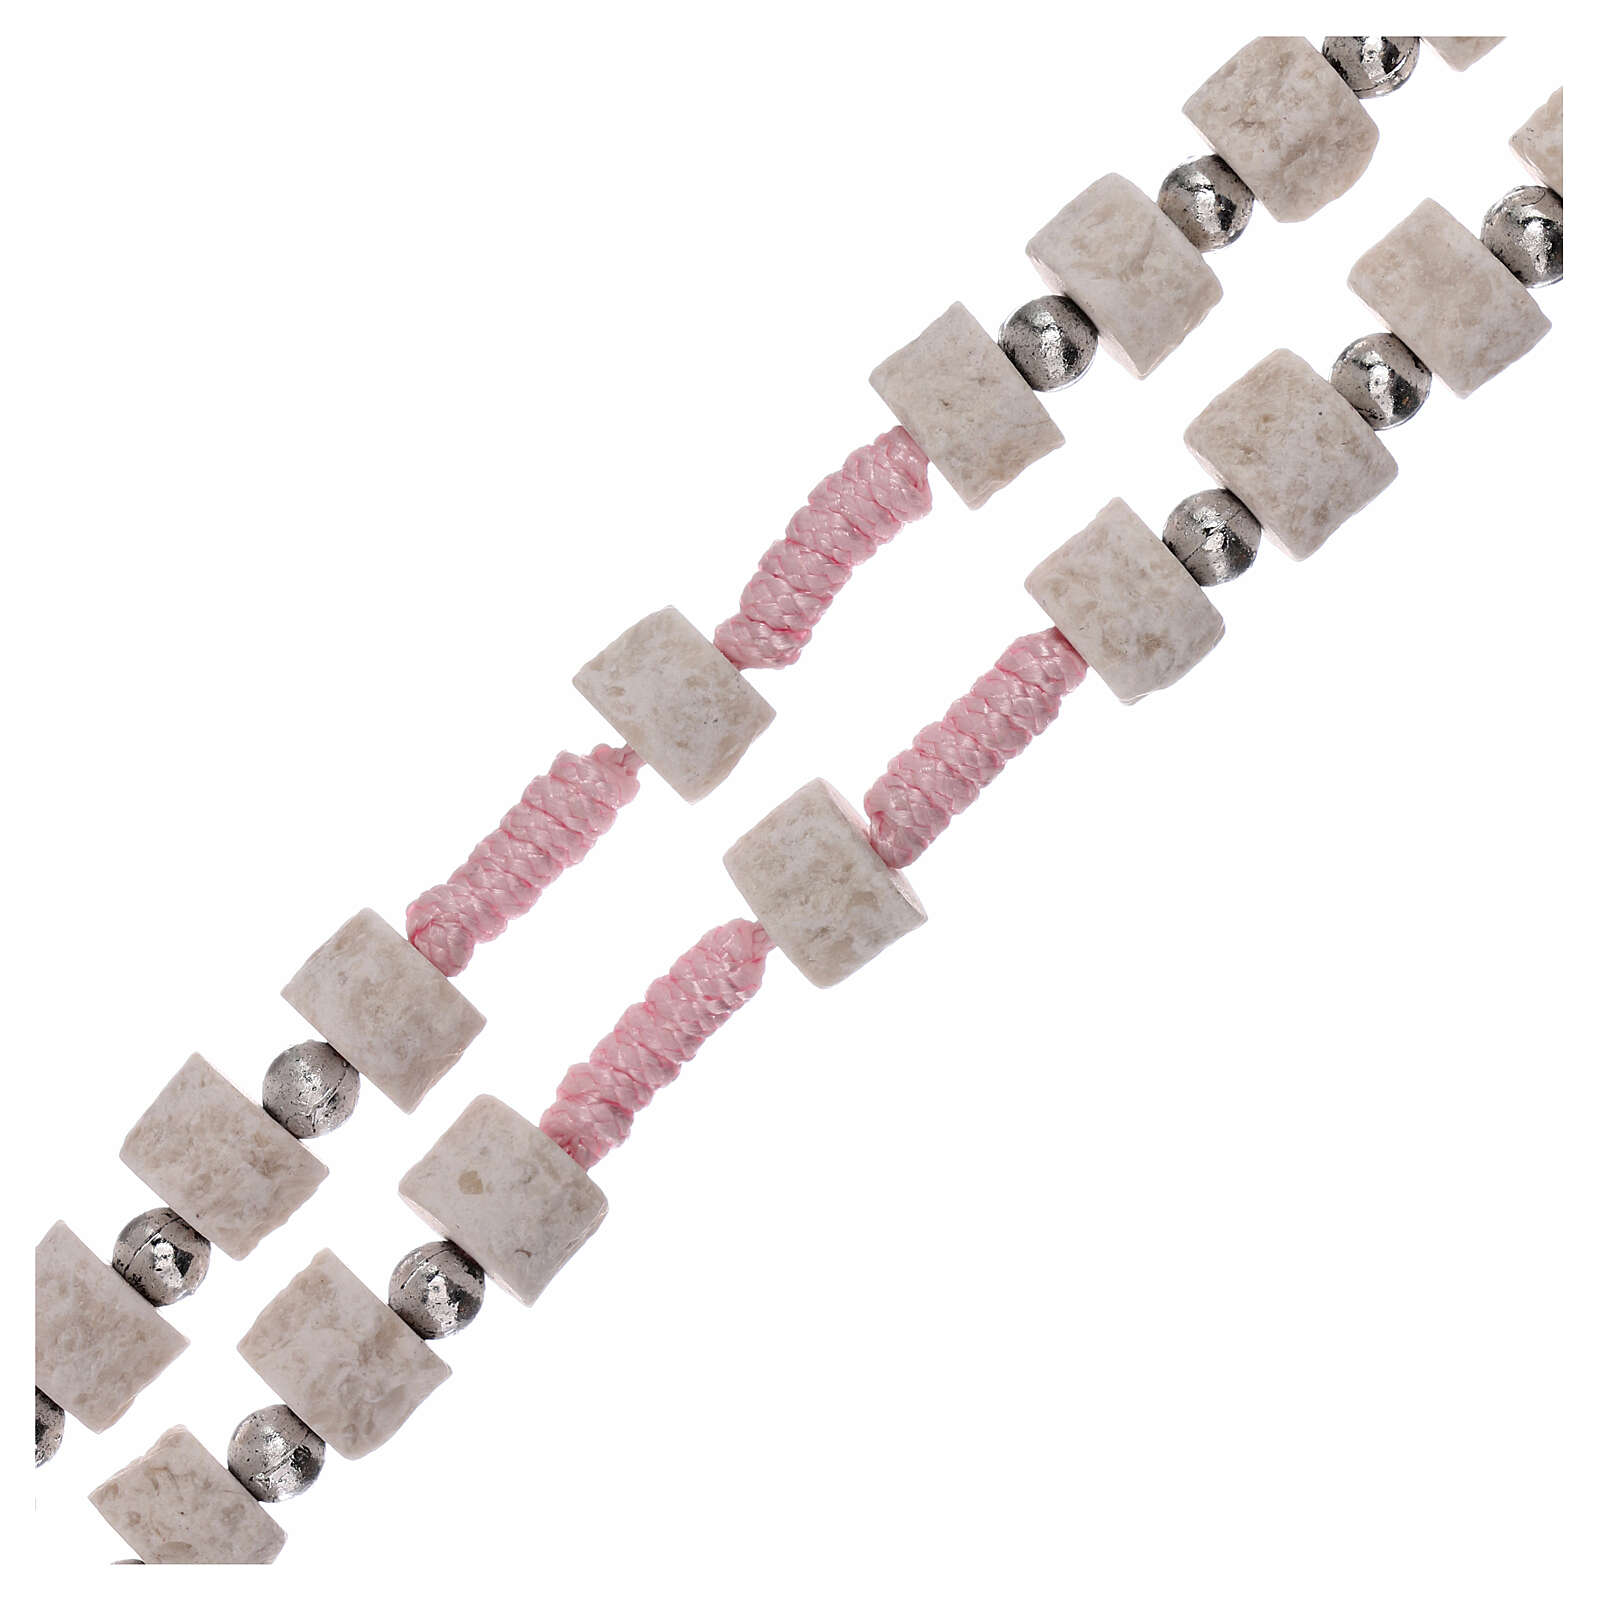 Rosario piedra blanca rosa Medjugorje 4